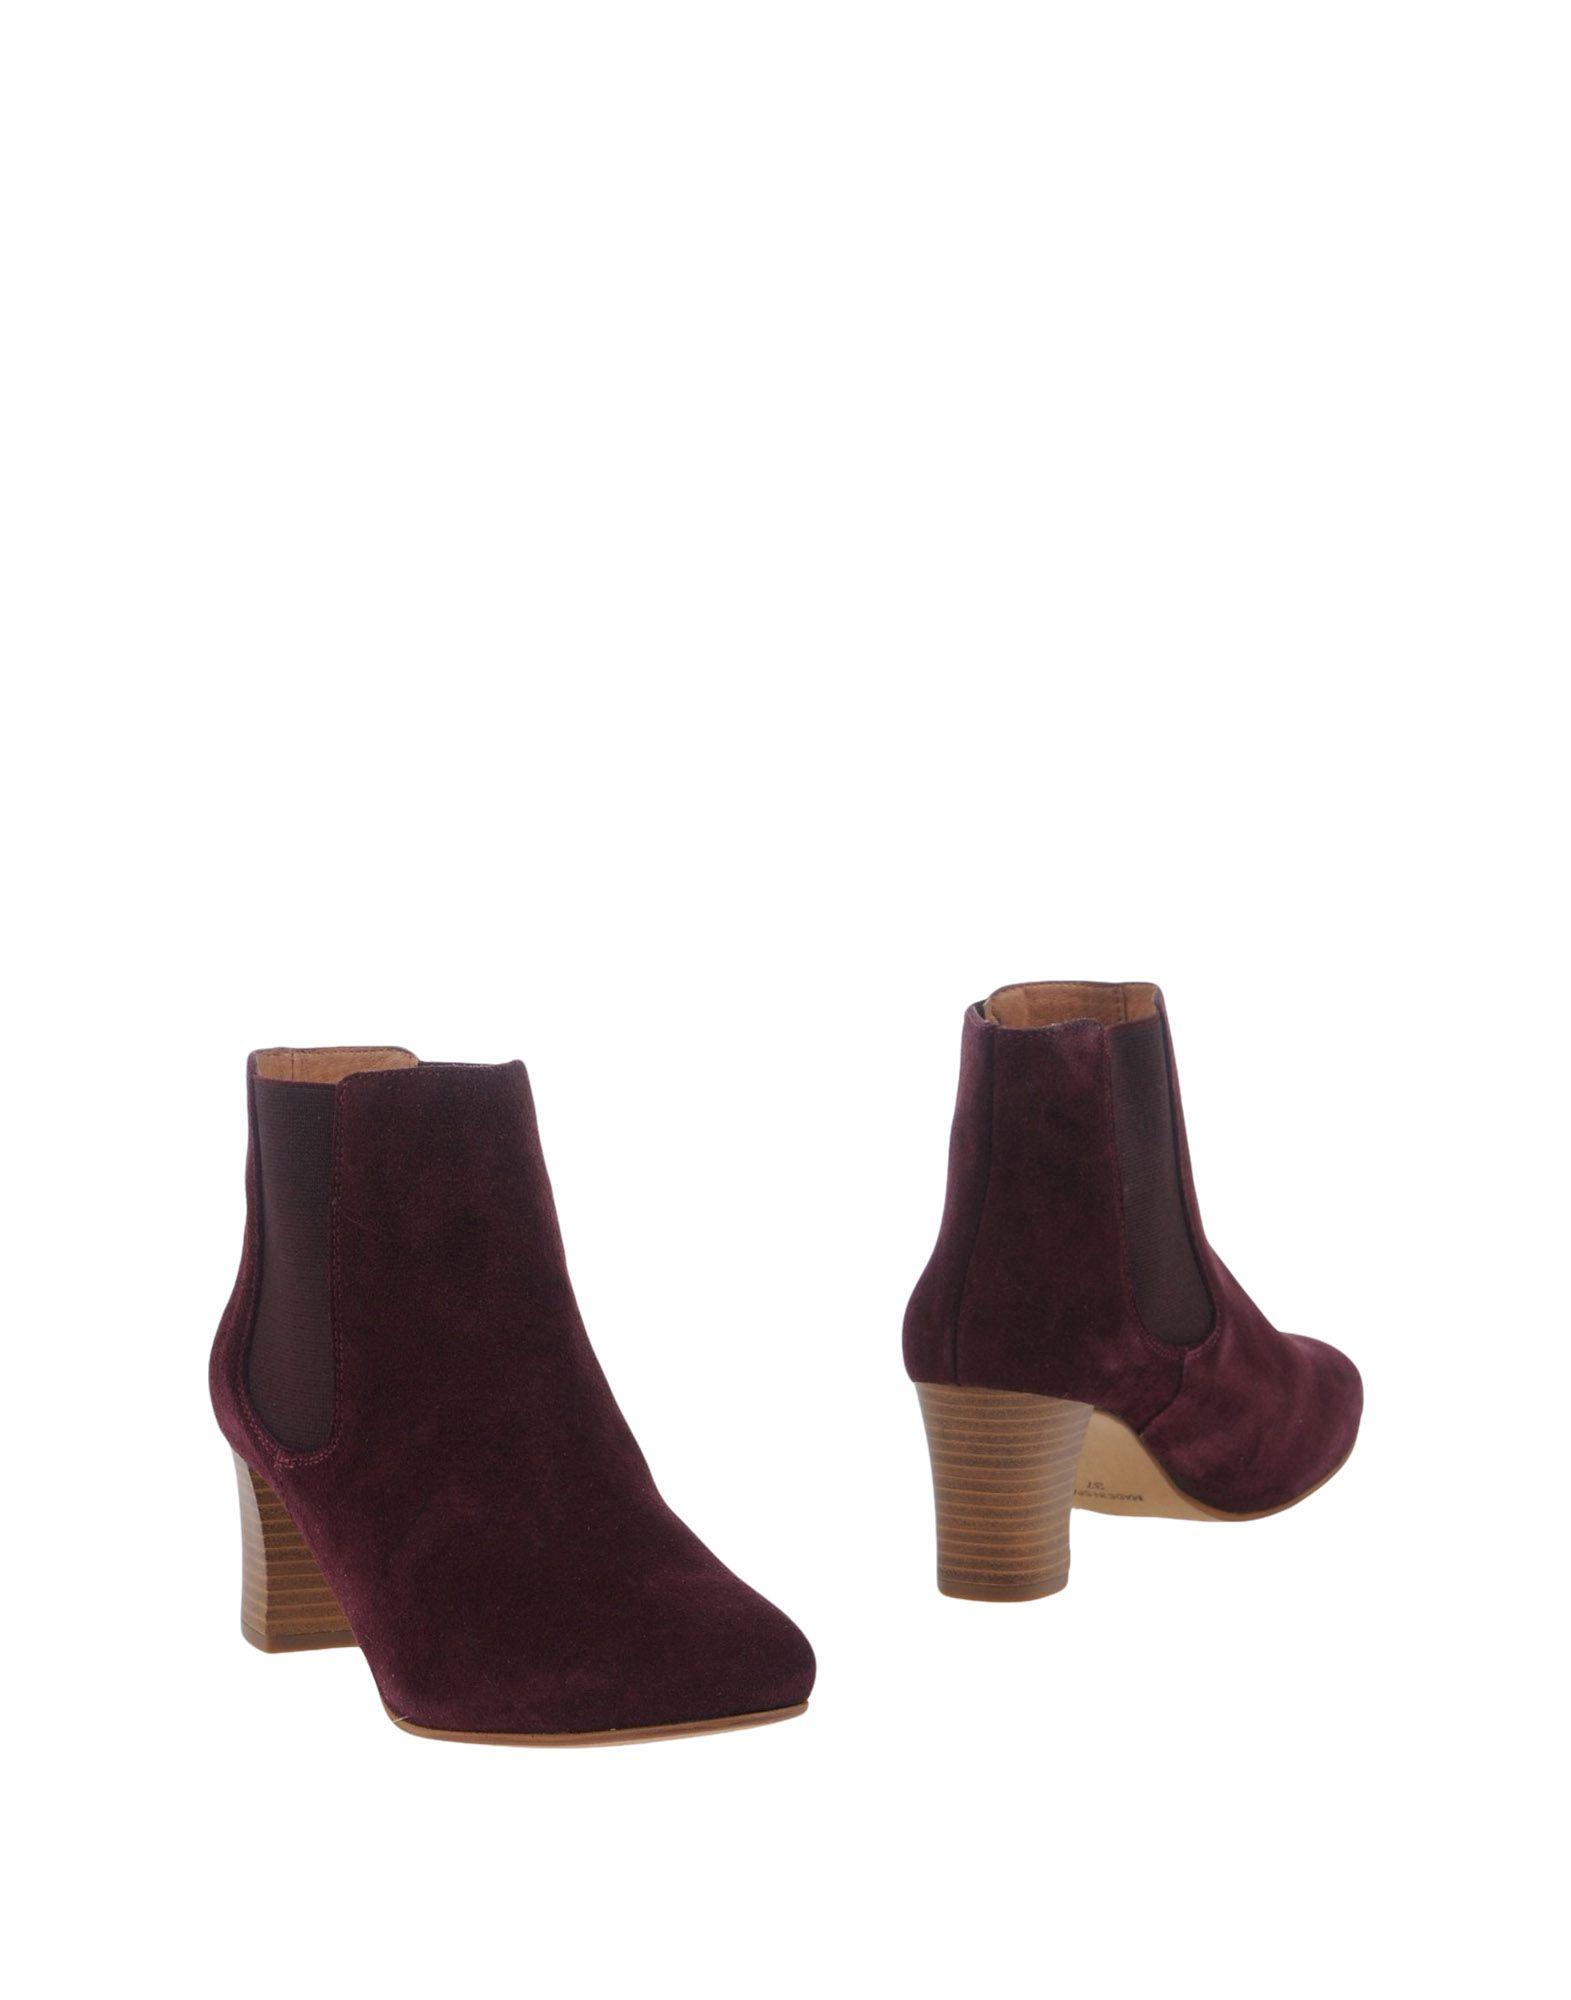 Flavio Creation Chelsea Damen Boots Damen Chelsea  11246547VD Gute Qualität beliebte Schuhe 720395